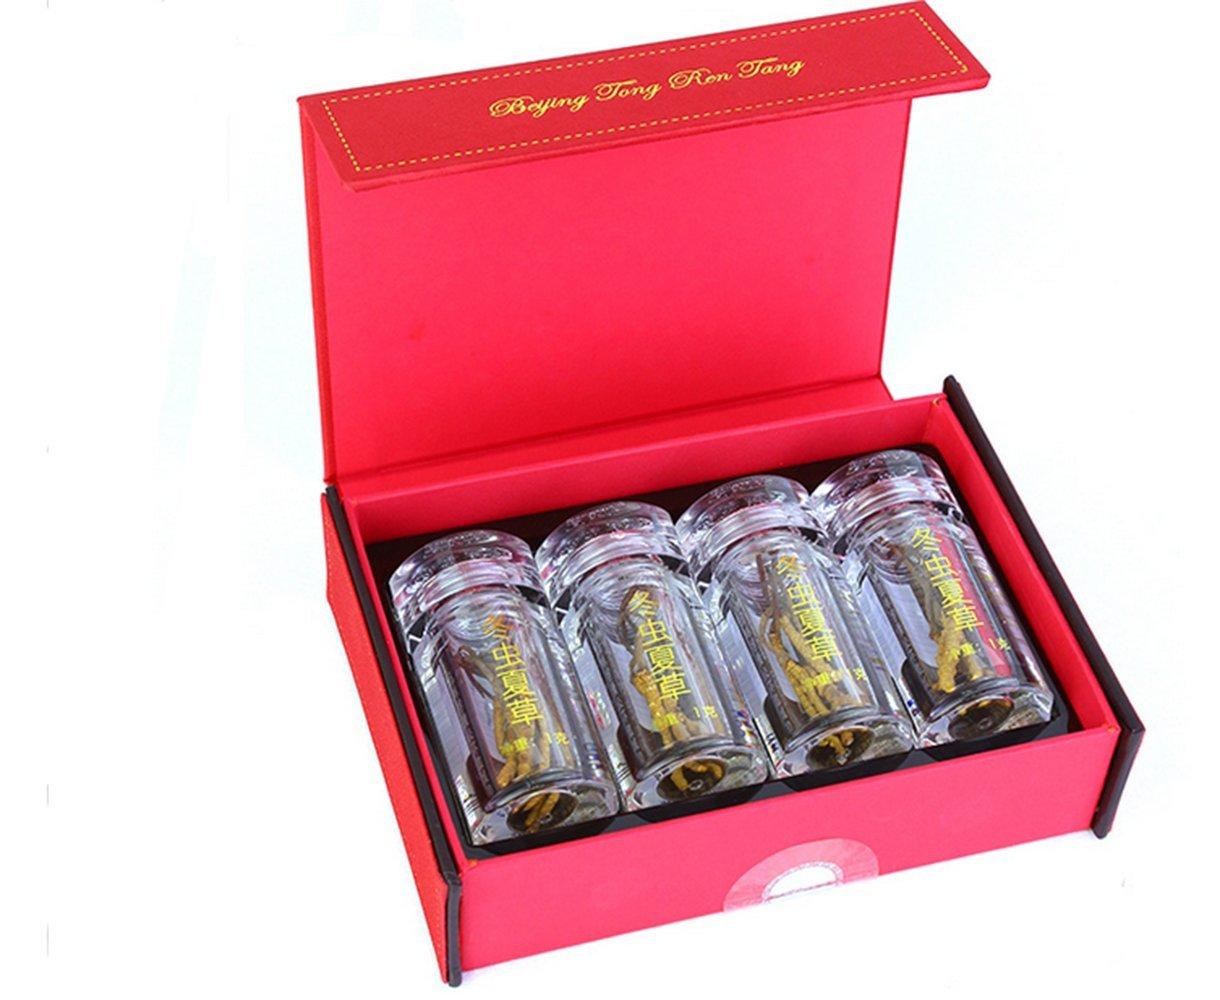 Beijing Tong Ren Tang Authentic Tibet Cordyceps Aweto 冬蟲夏草4g Grade -40